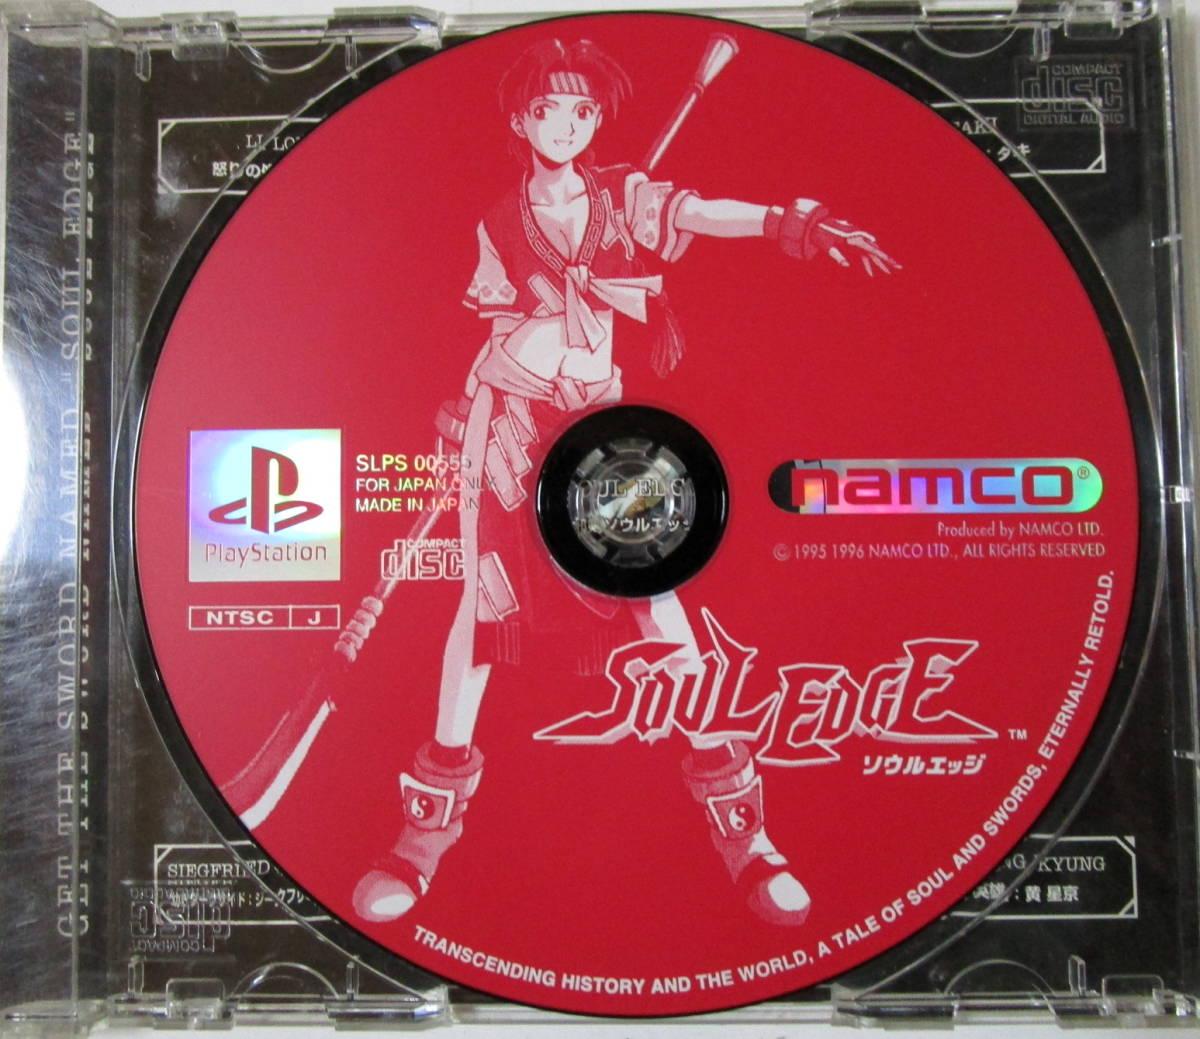 Sony Playstation PS1 Namco Soul Edge SLPS00555 ソニー プレイステーション ナムコ ソウルエッジ ソフト アーケード武器格闘ゲーム_画像1